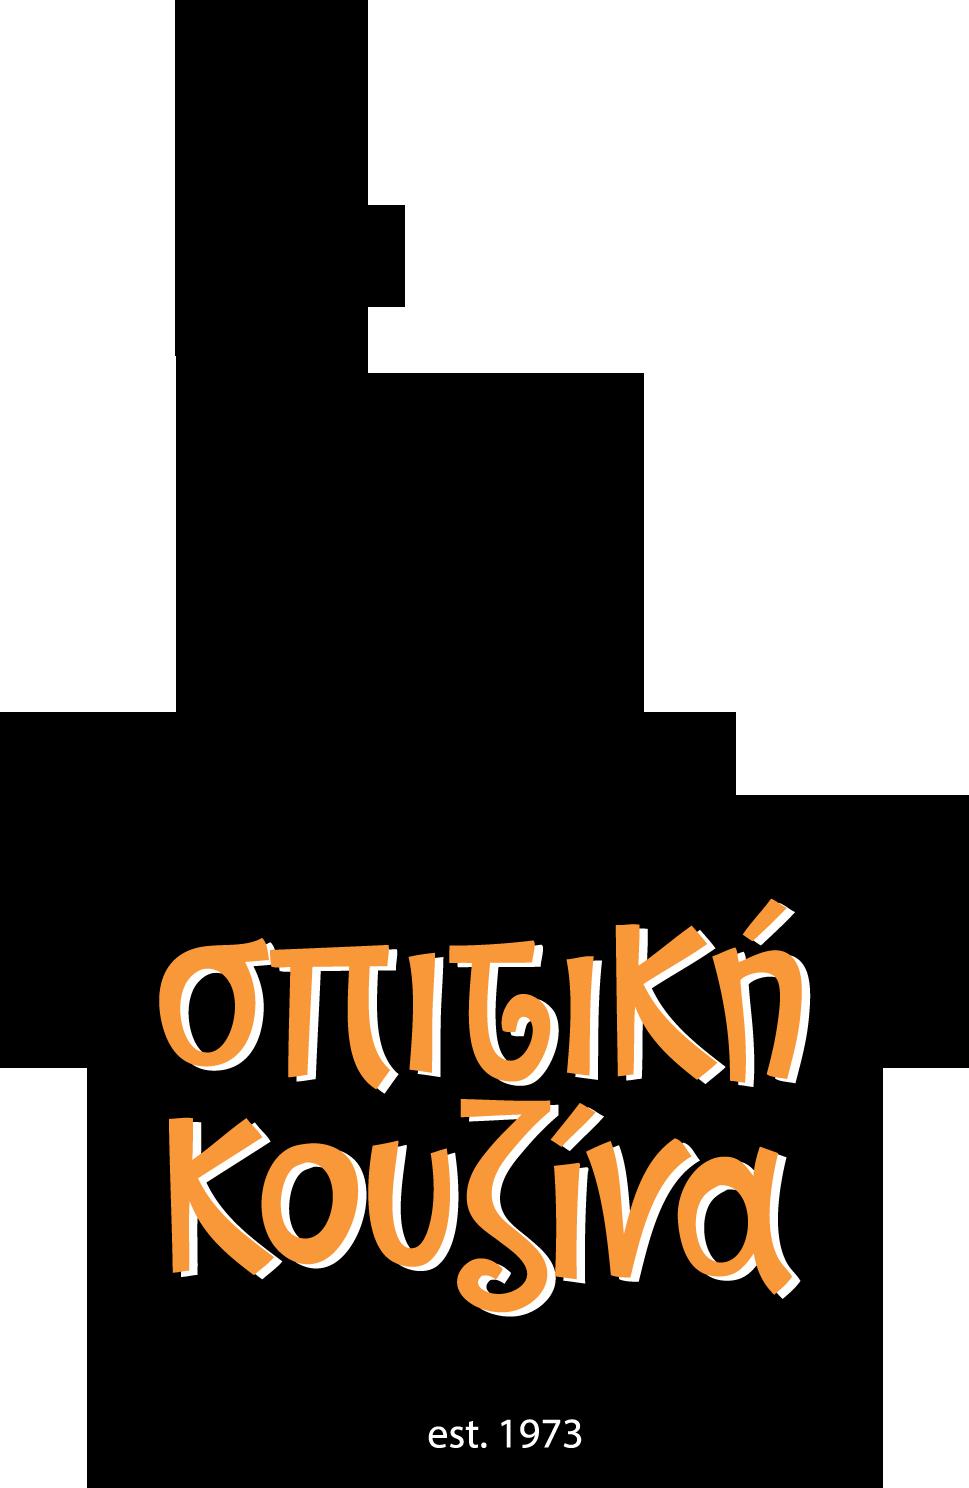 Spitiki Kouzina